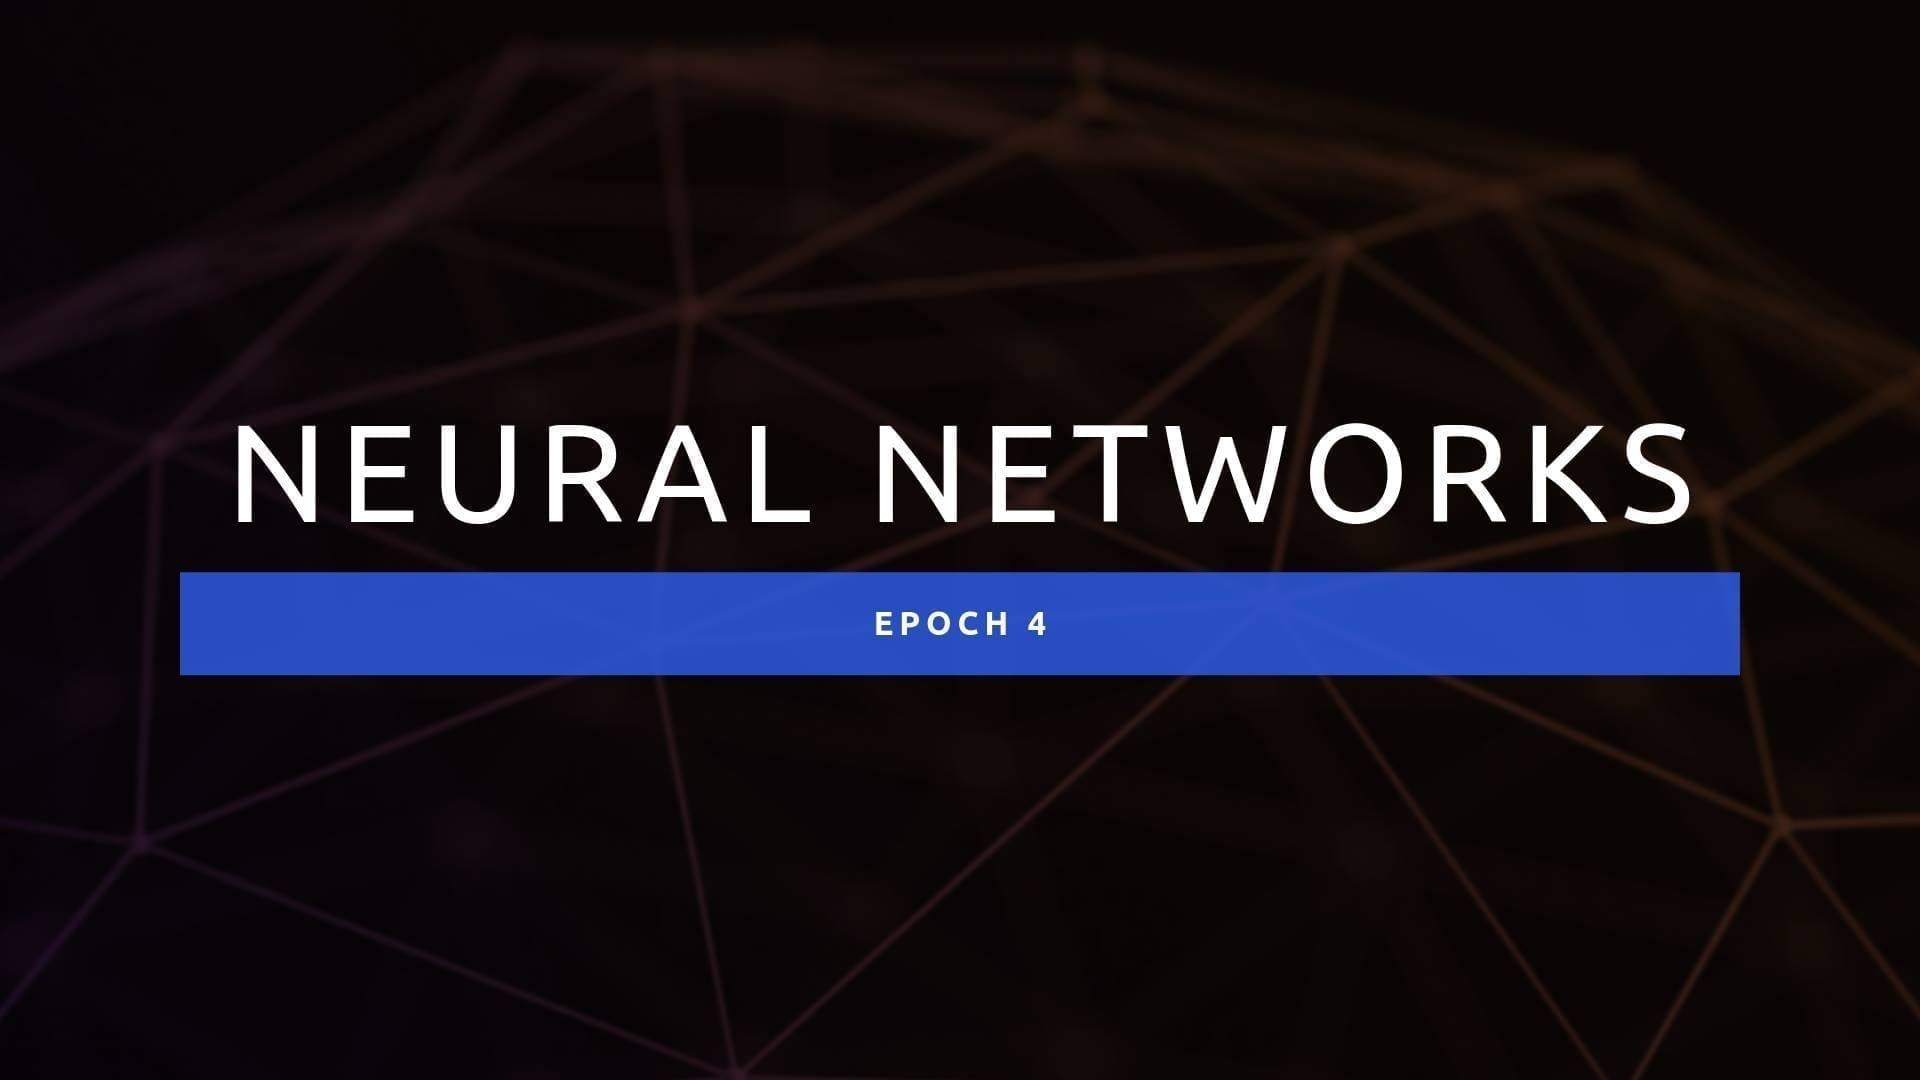 Epoch 4: Neural Networks